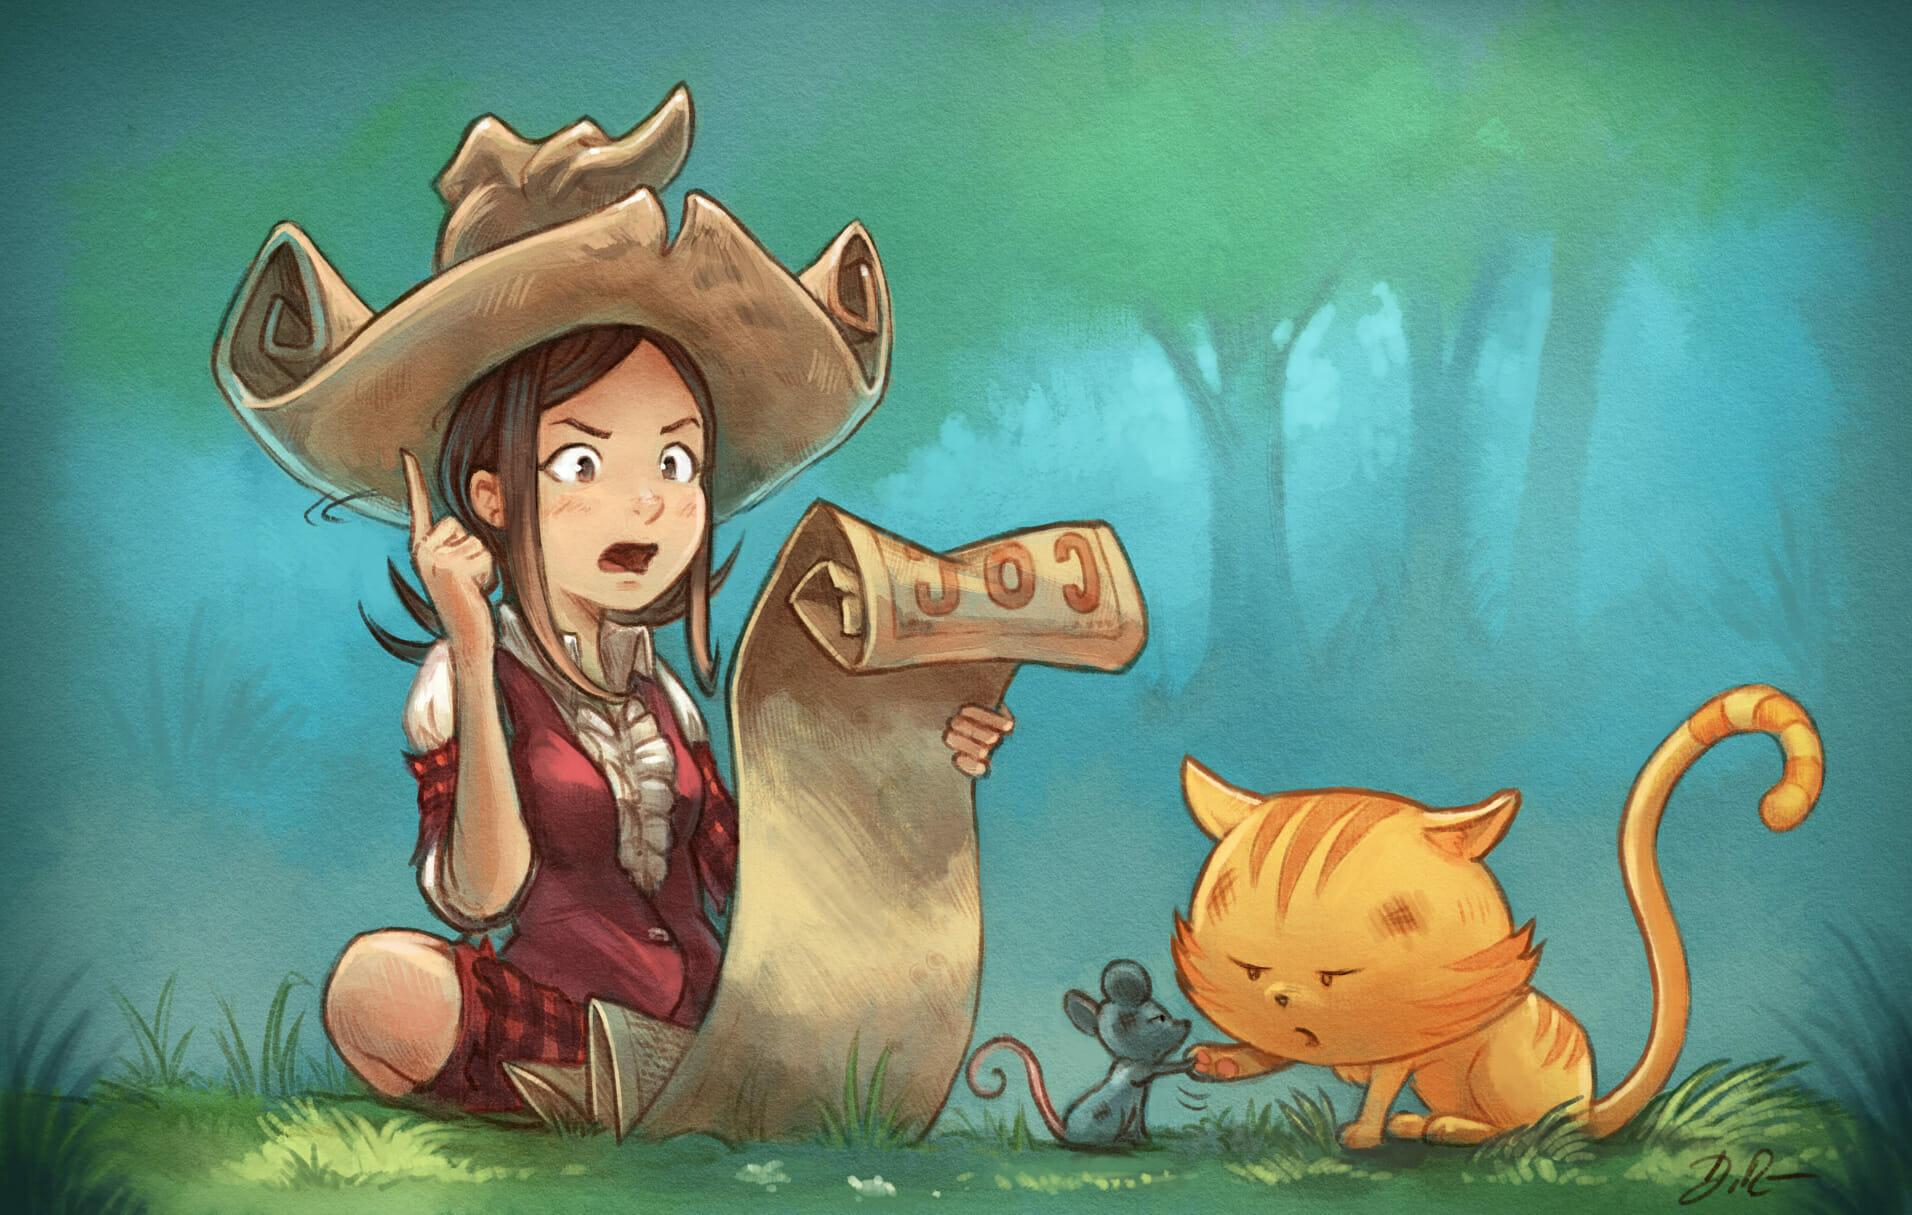 Witchcraft: Magic of Hereva / Pepper & Carrot RPG